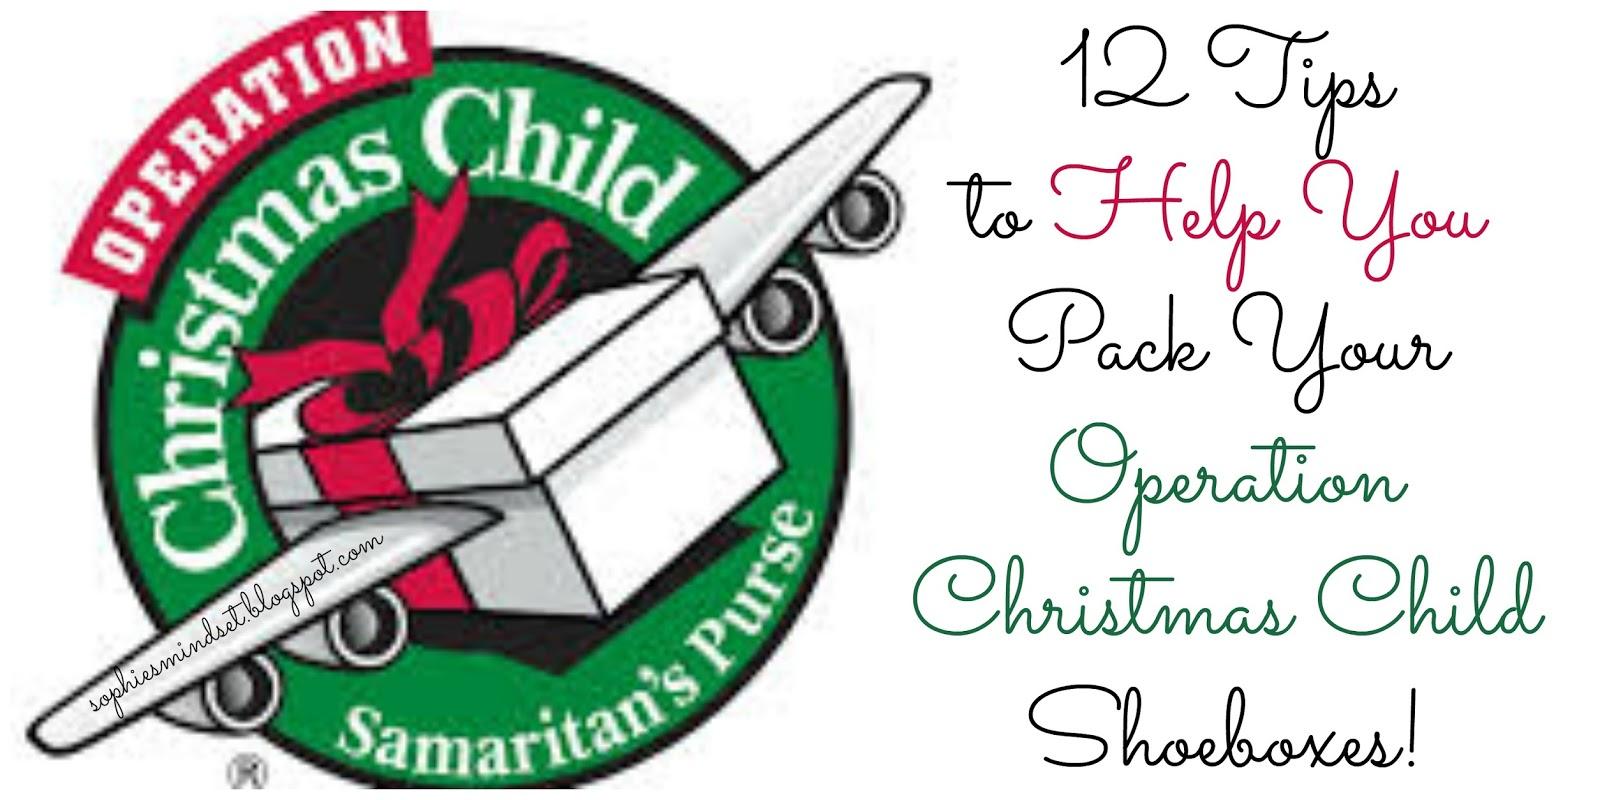 Sophie's Mindset: 12 Tips for Operation Christmas Child Shoeboxes.